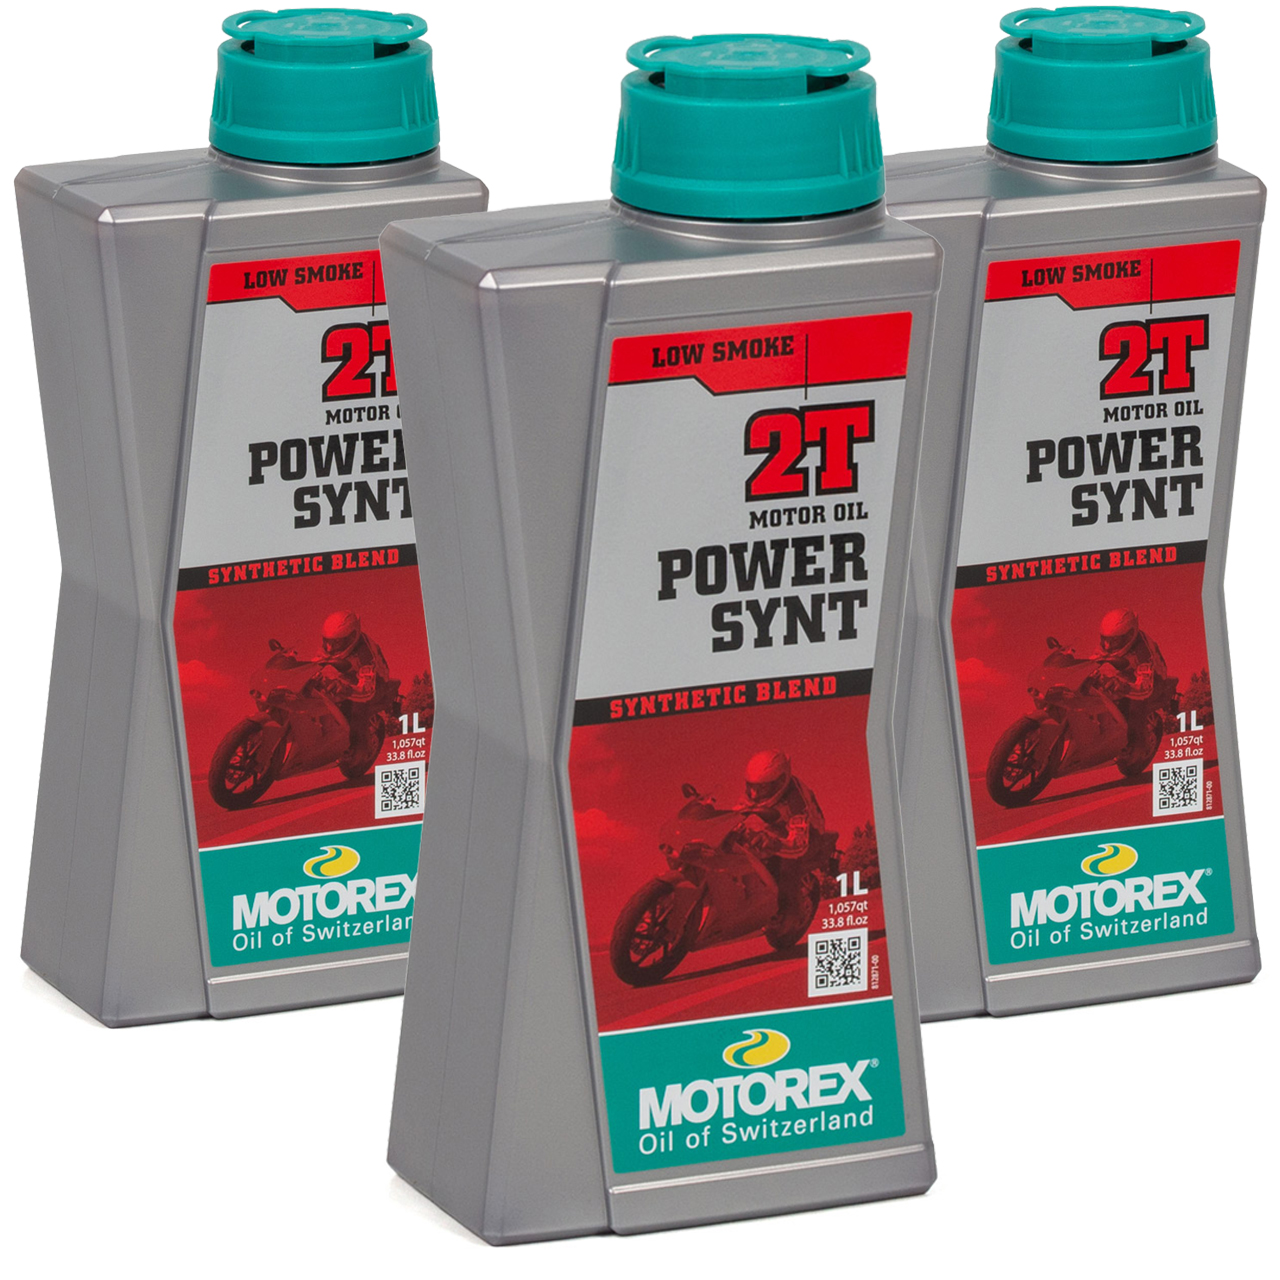 MOTOREX Power Synt 2T LOW SMOKE Motoröl API TC JASO FD ISO-L-EGD - 3L 3 Liter